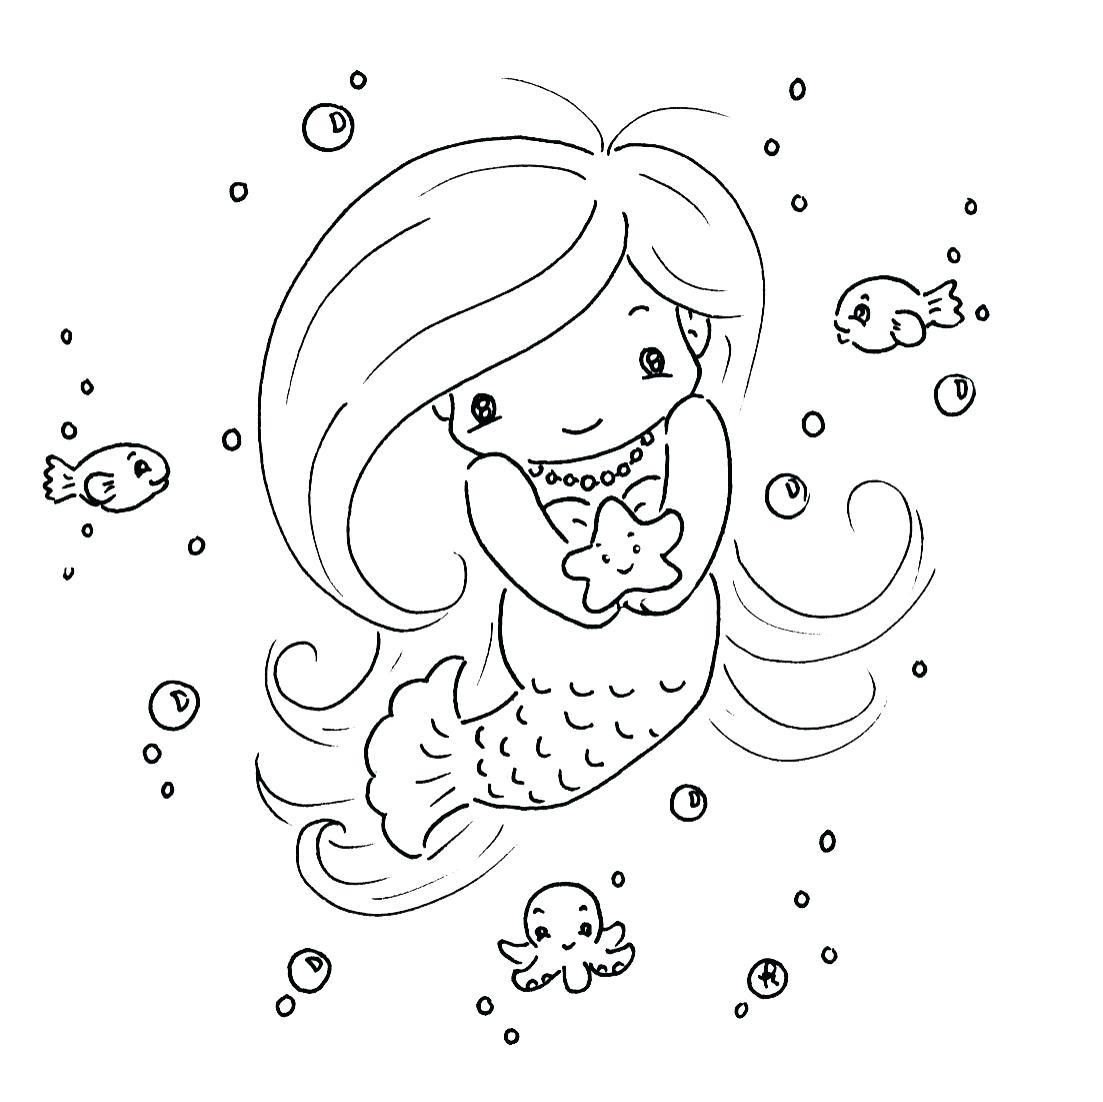 Mermaid Coloring Pages - coloring.rocks!